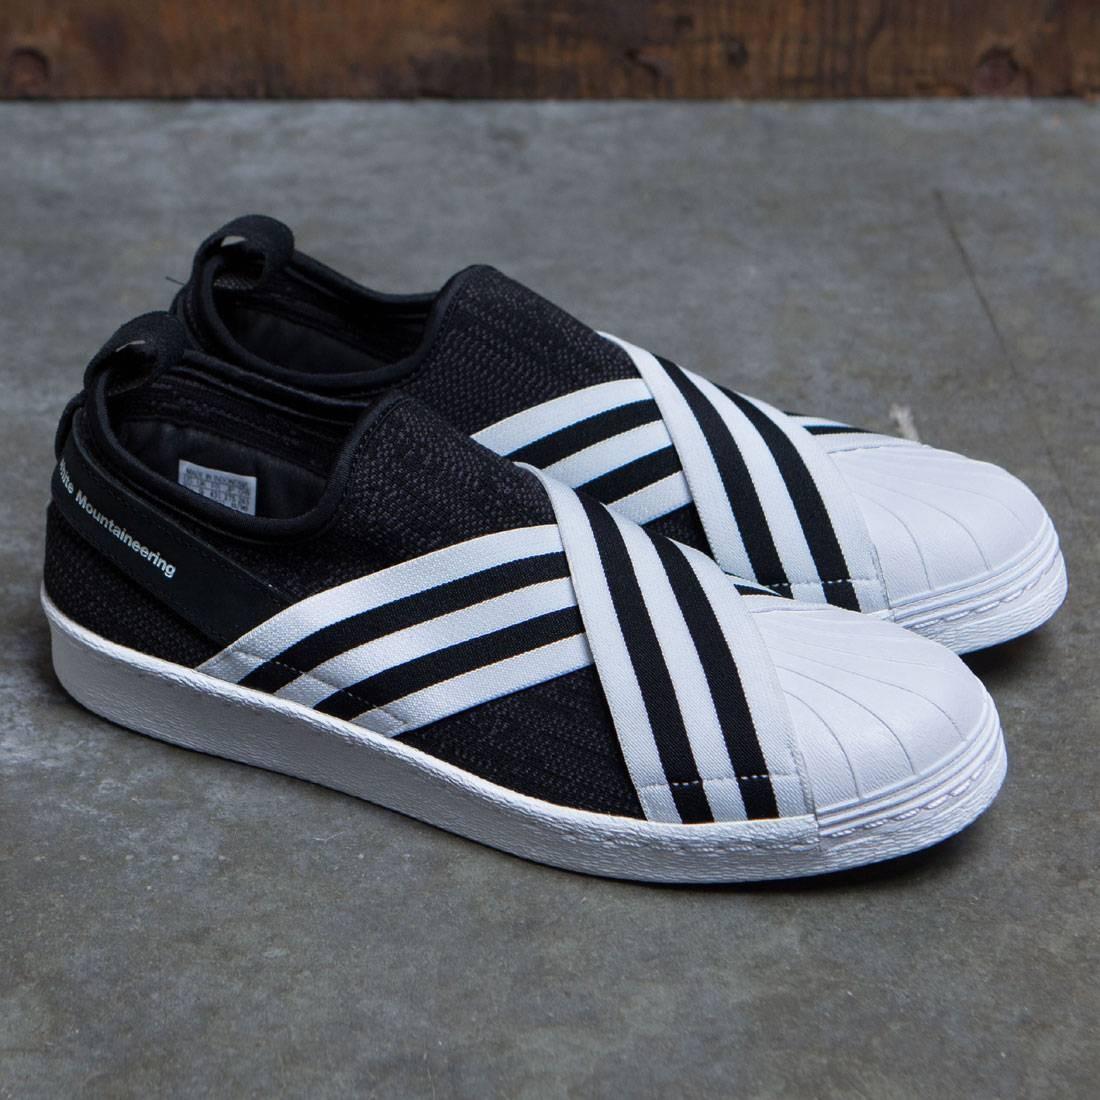 3d9584155917 Pantofi adidas Superstar Slip On BZ0111 Ftwwht Ftwwht Ftwwht